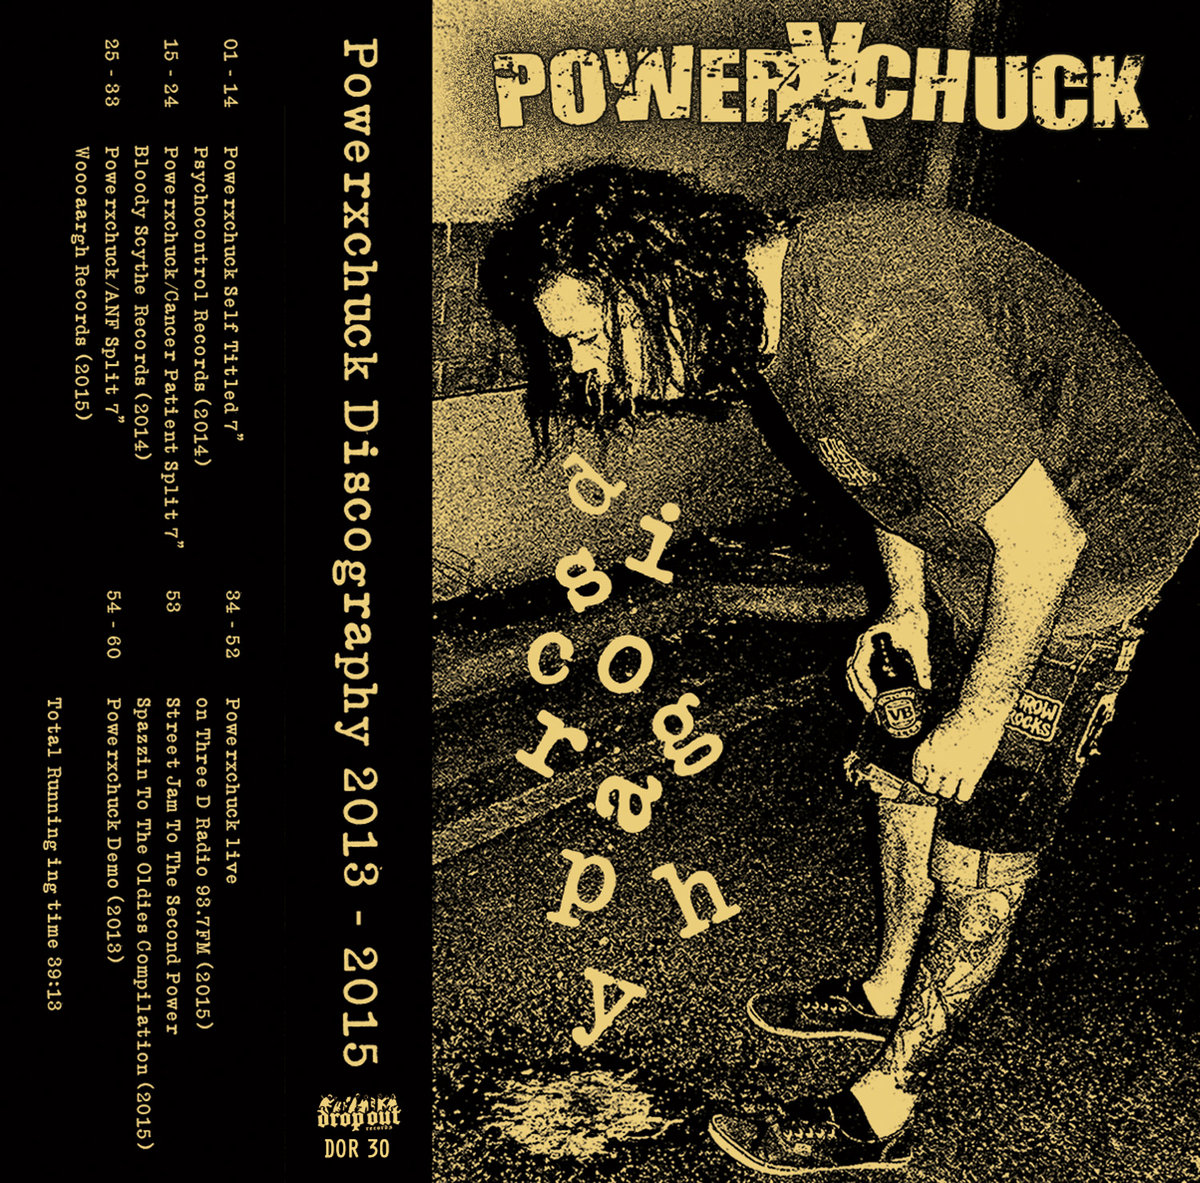 POWER X CHUCK - Discography